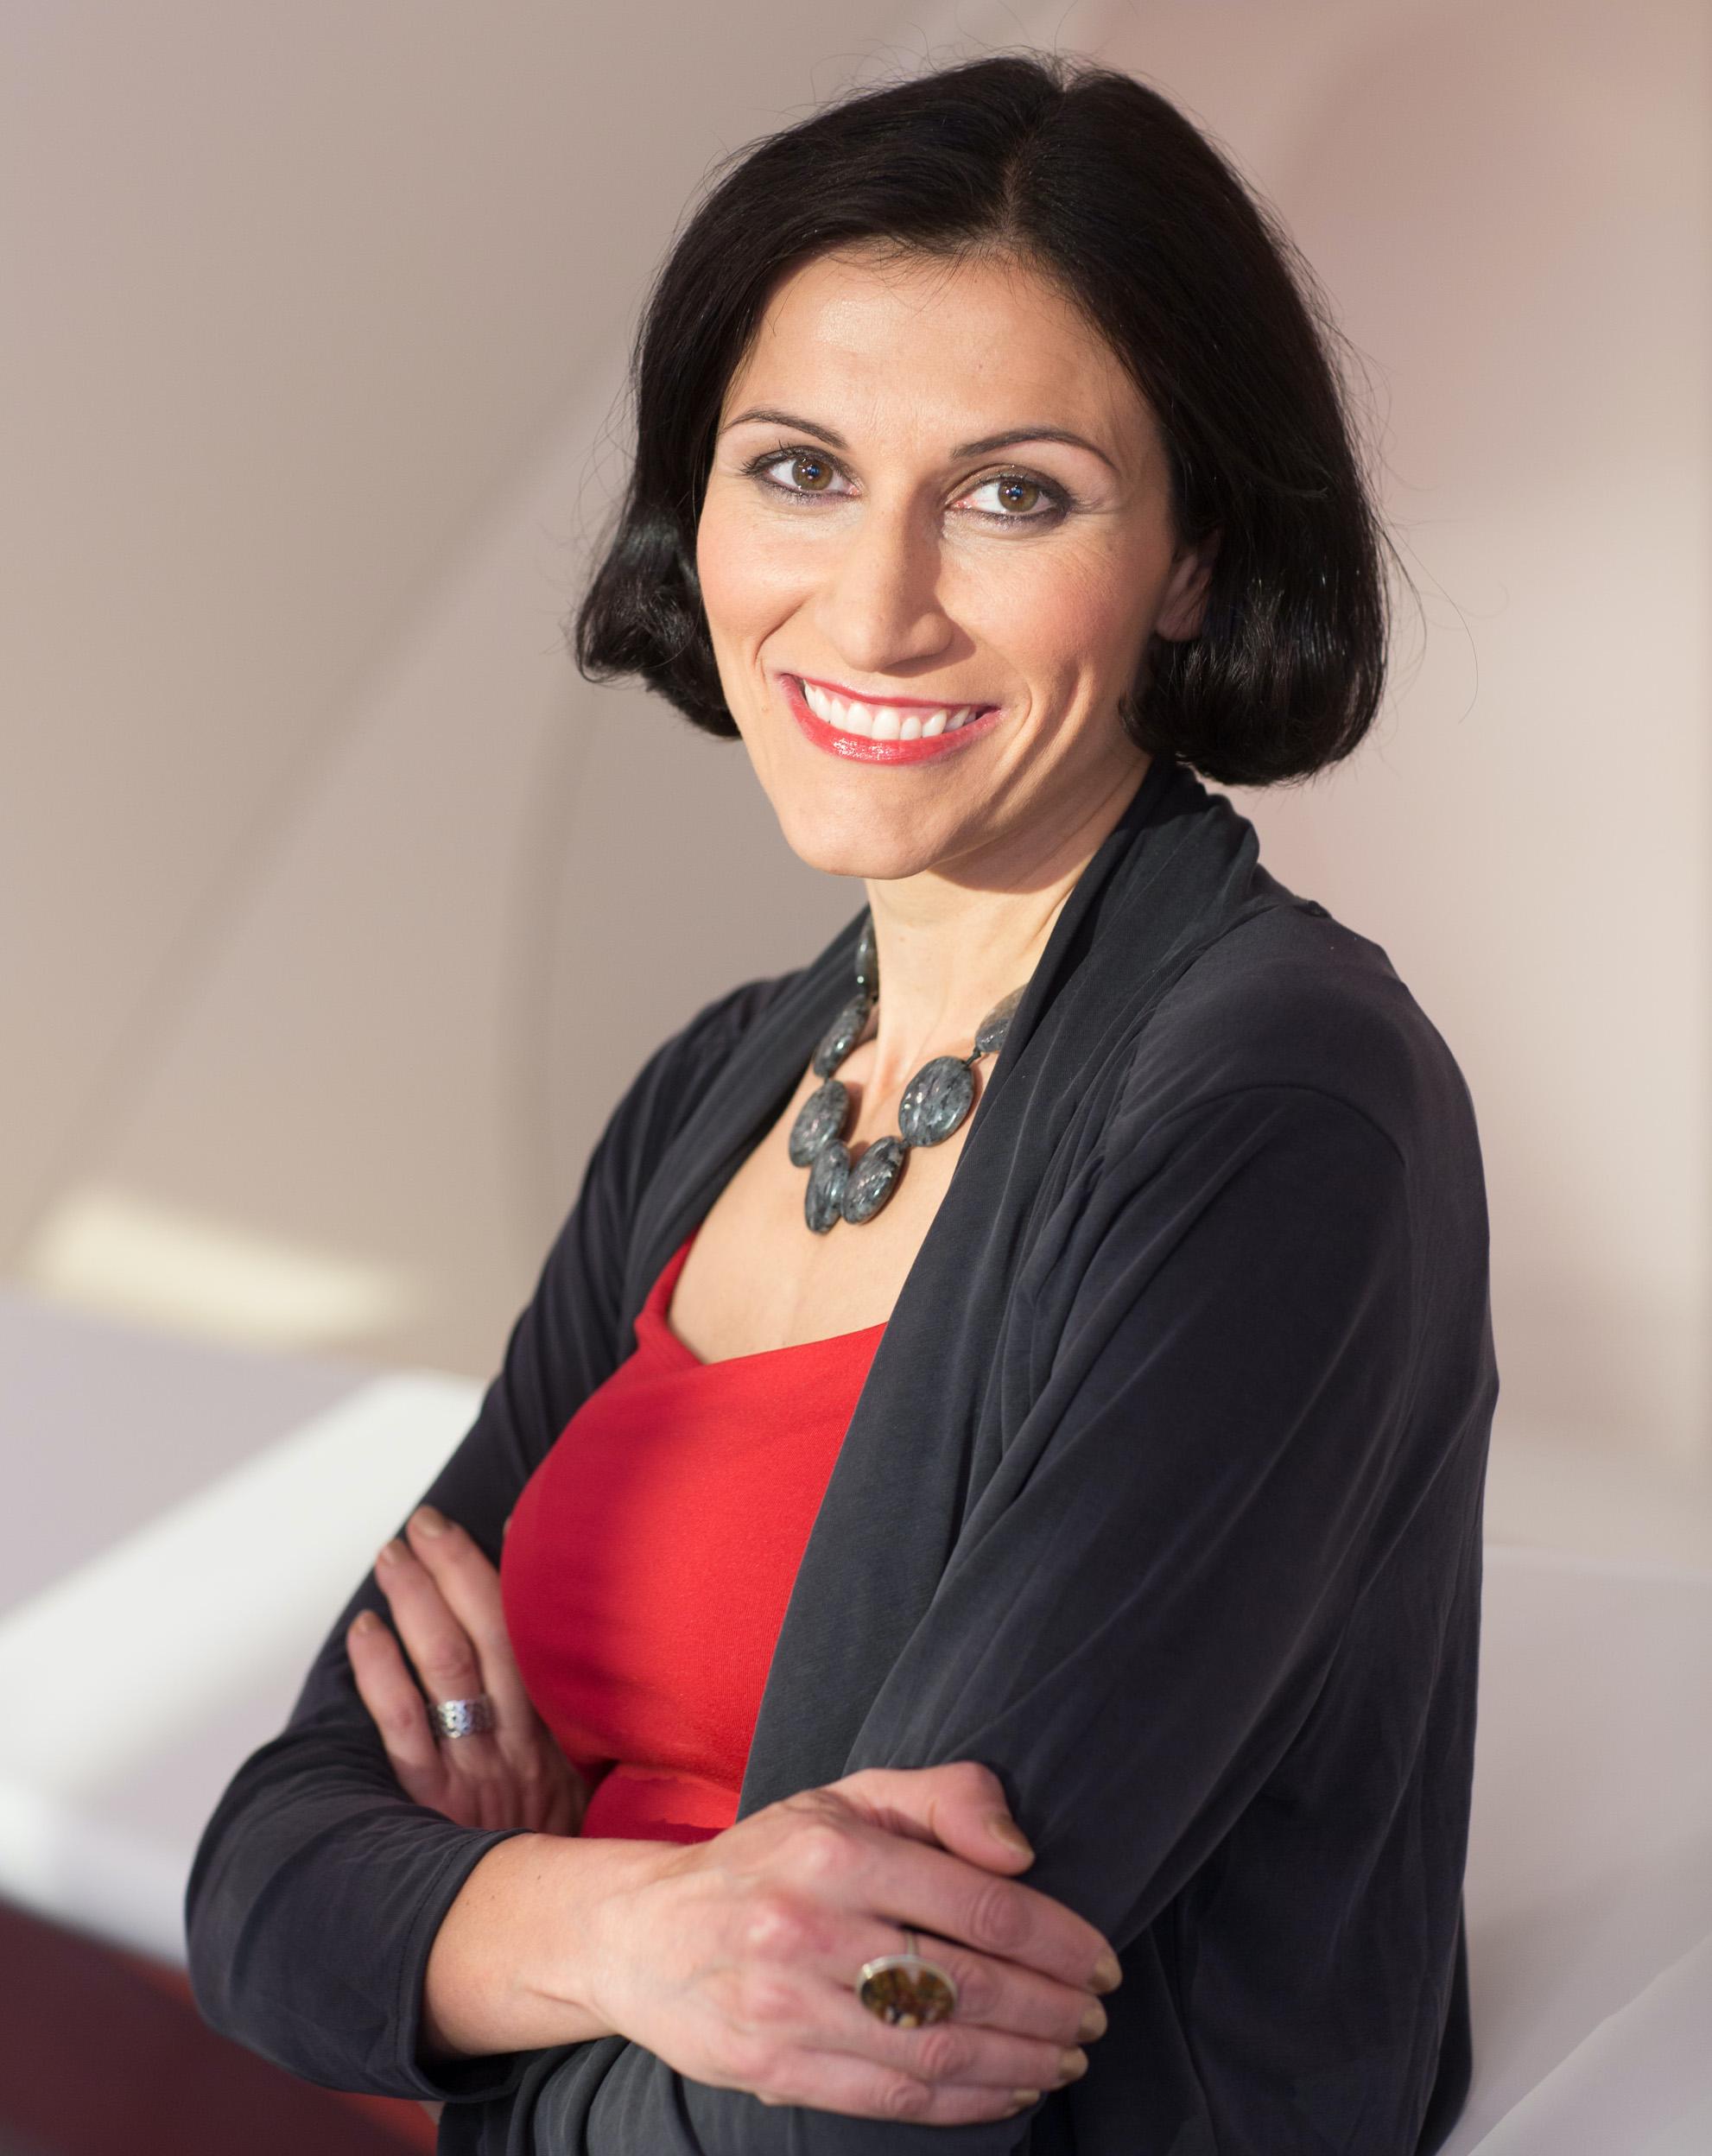 Adriana Dergam